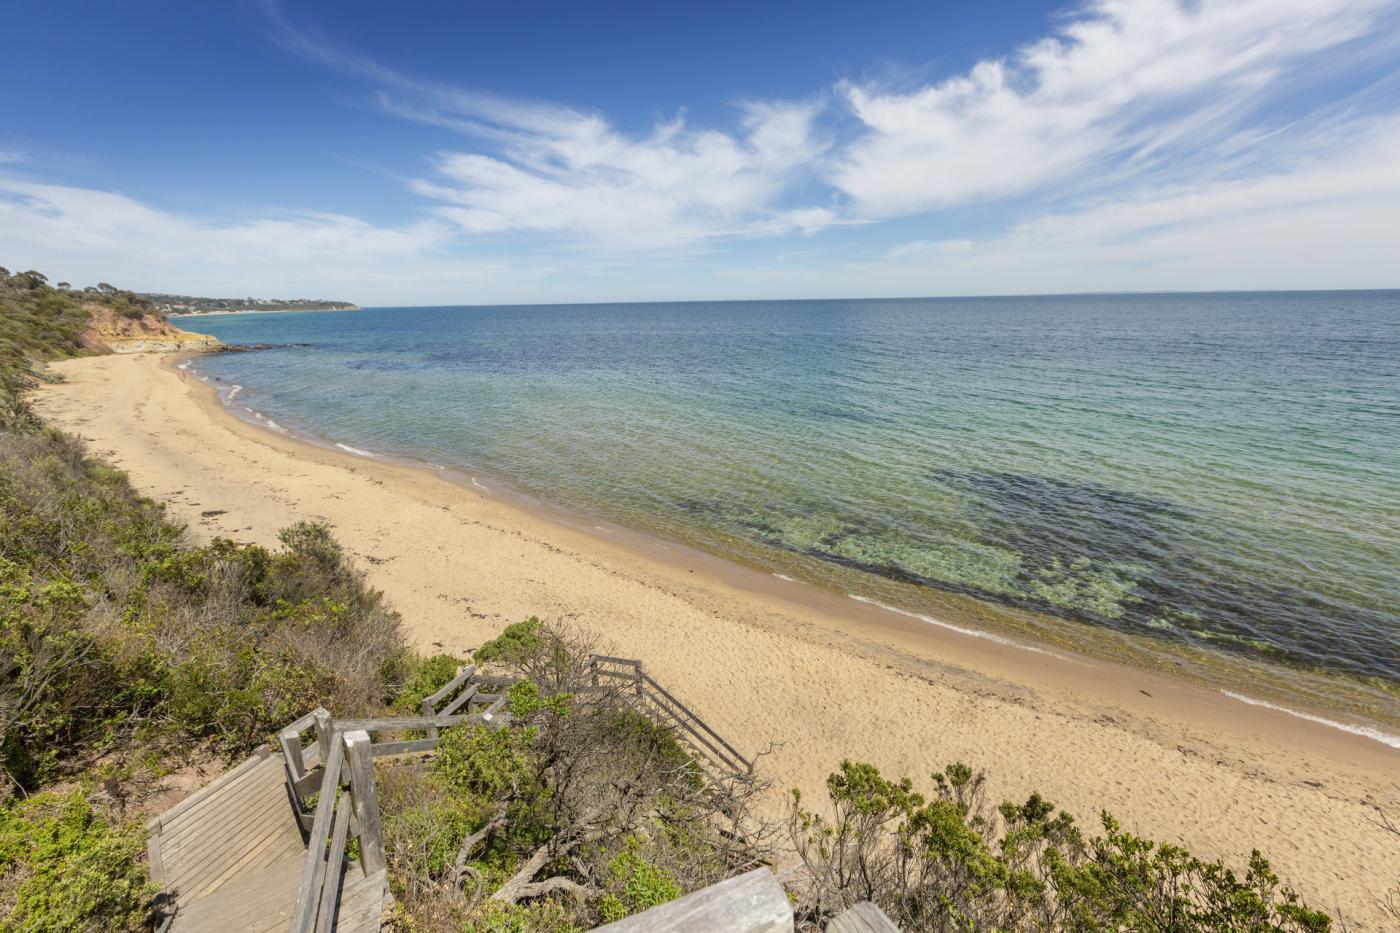 Birdrock Beach, Mornington Peninsula